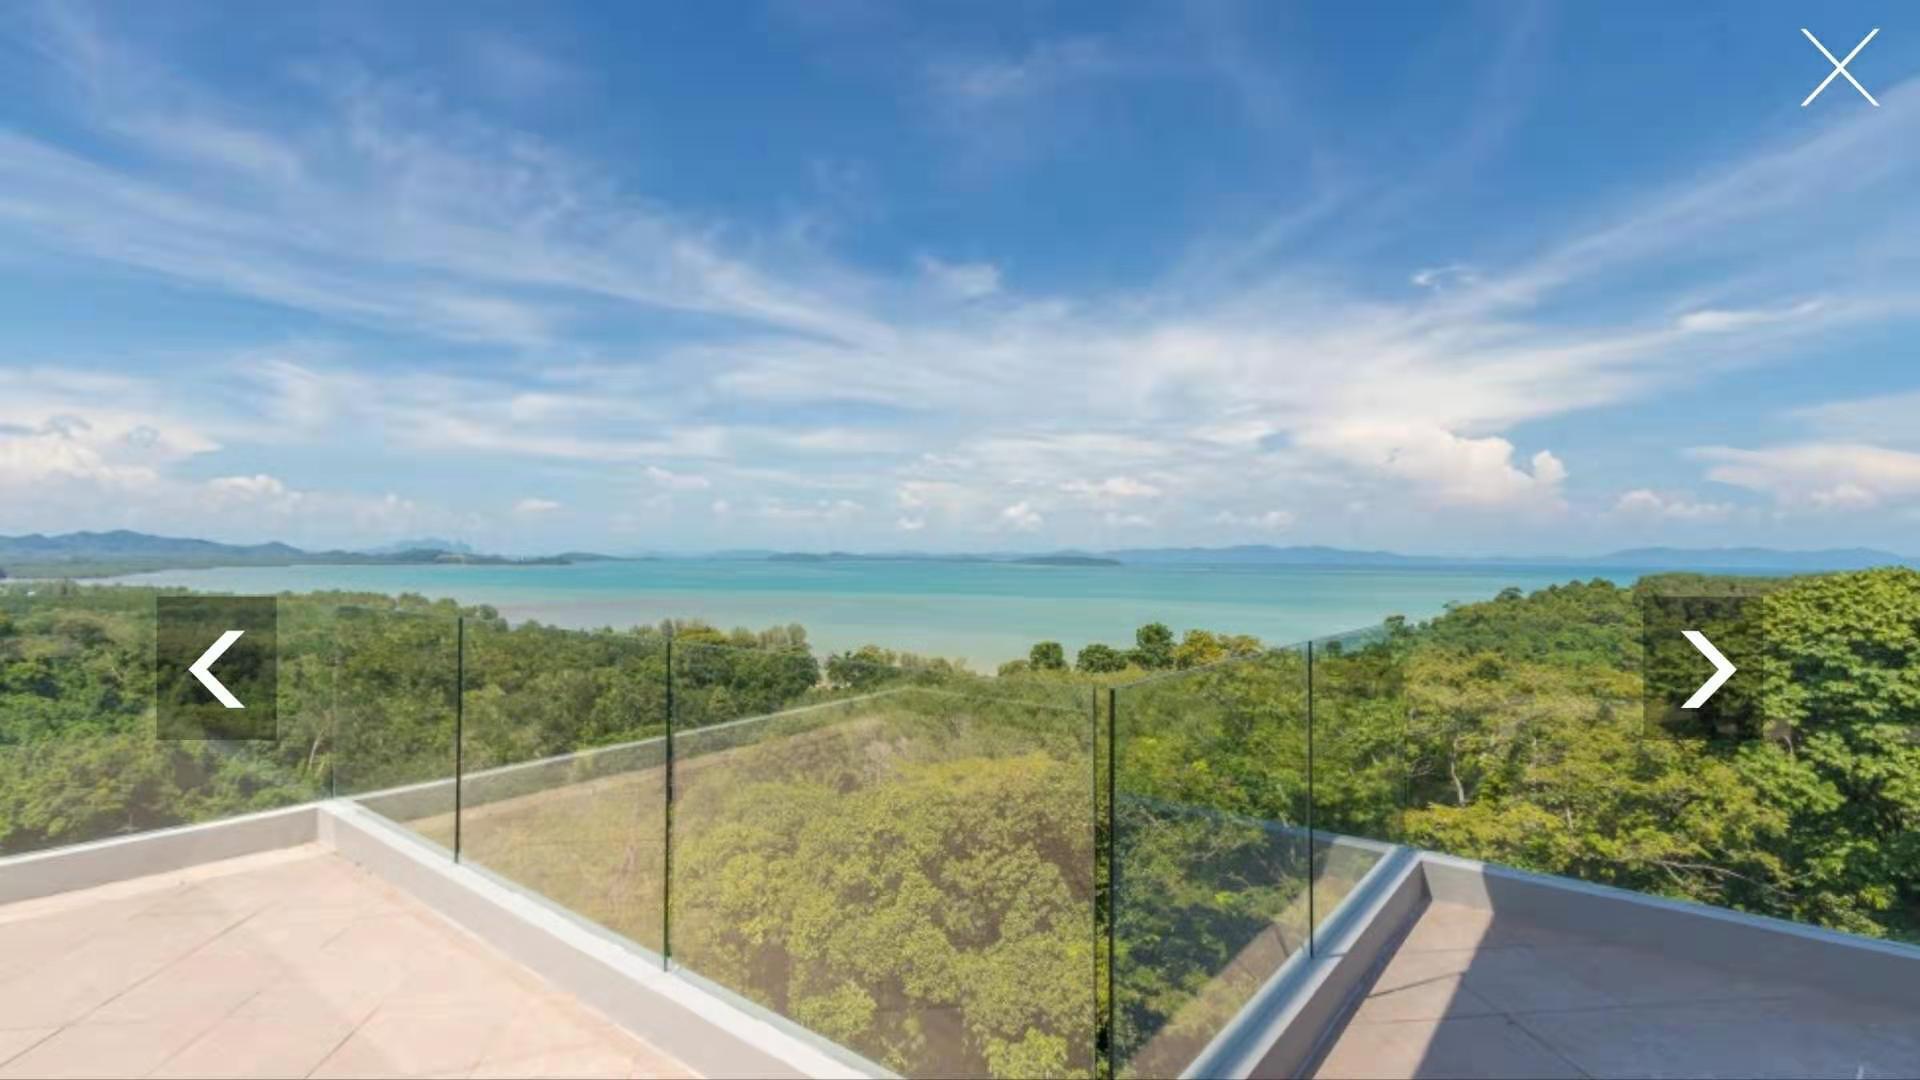 5BDR Amazing Ocean View Pool Villa วิลลา 5 ห้องนอน 5 ห้องน้ำส่วนตัว ขนาด 1000 ตร.ม. – ป่าคลอก